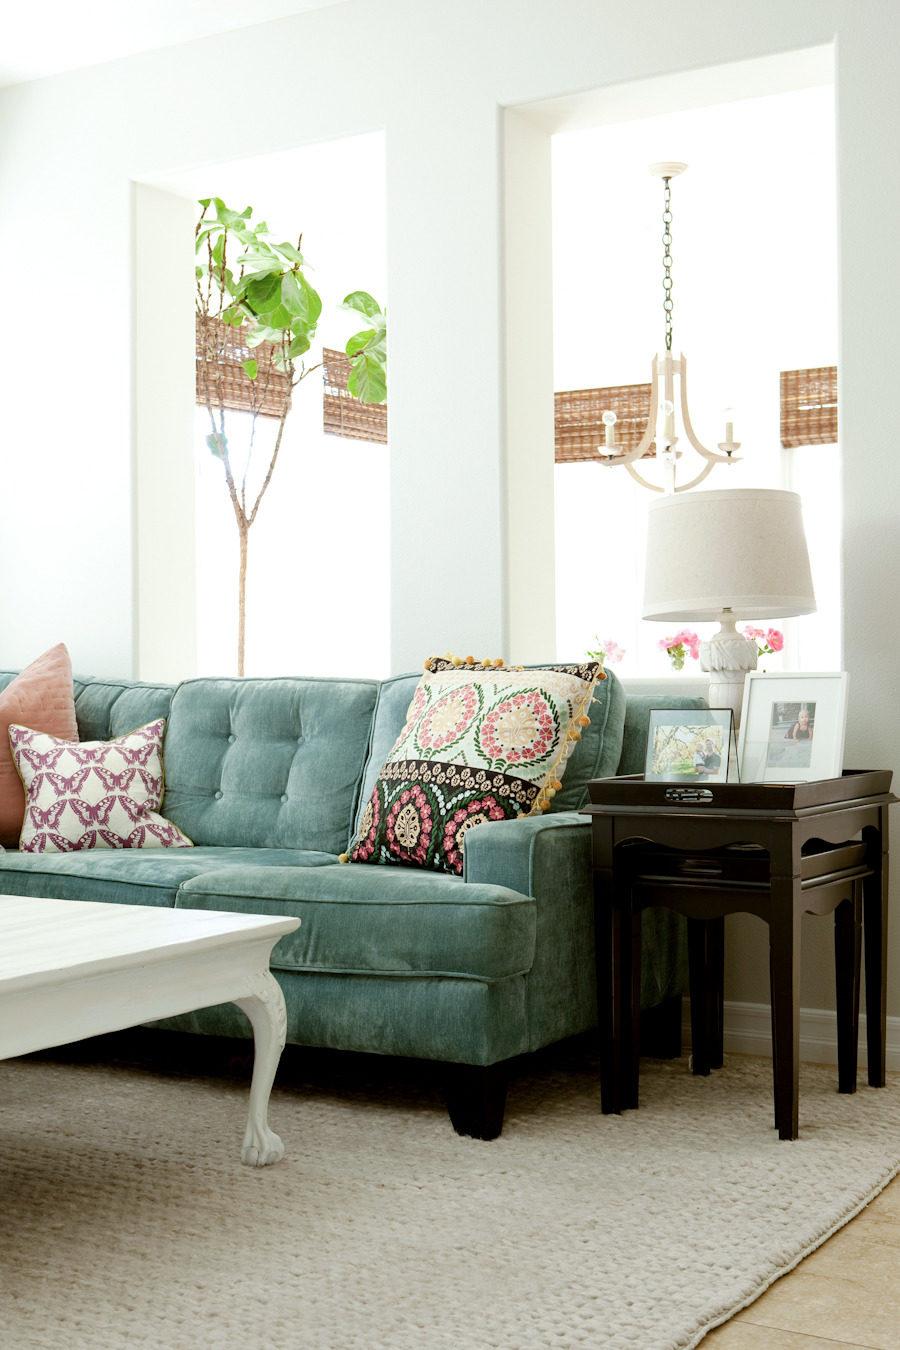 14+ Beautiful Sage Green Velvet Sofa Options - IMAGE via Style Me Pretty, Design: Nicole Davis, Photography: Ashlee Raubach